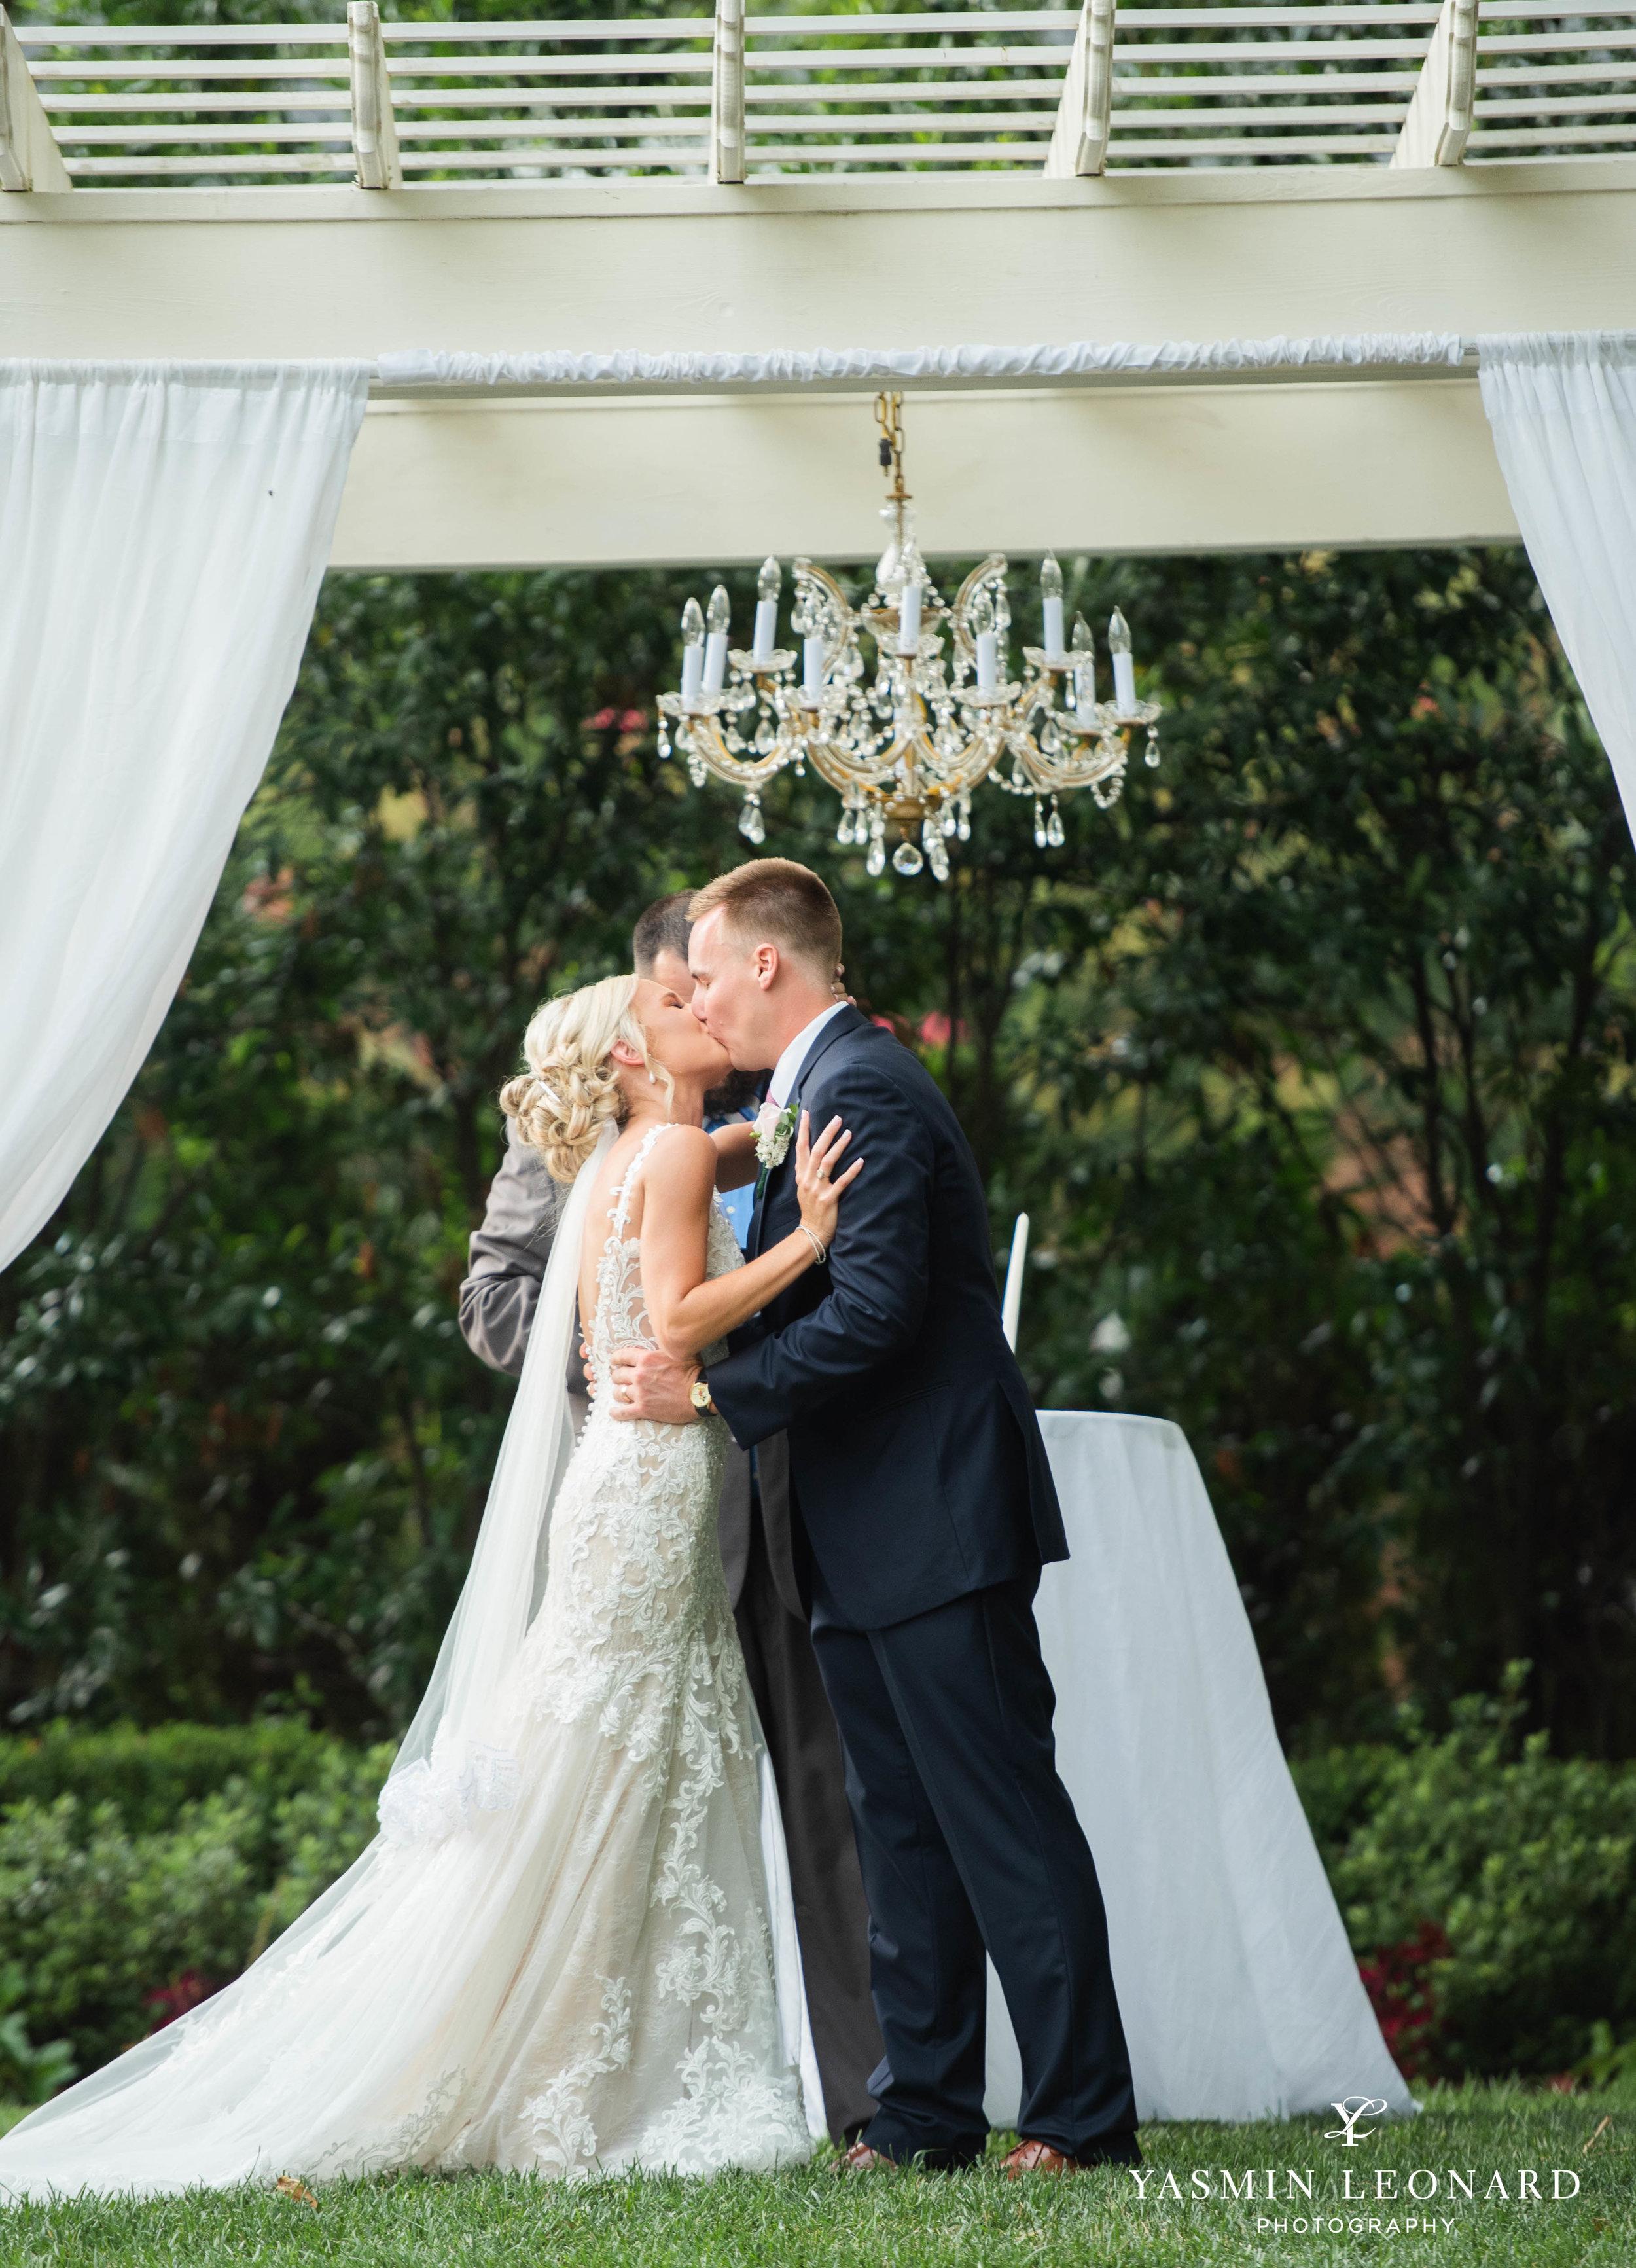 Separk Mansion - NC Weddings - Gastonia Wedding - NC Wedding Venues - Pink and Blue Wedding Ideas - Pink Bridesmaid Dresses - Yasmin Leonard Photography-24.jpg